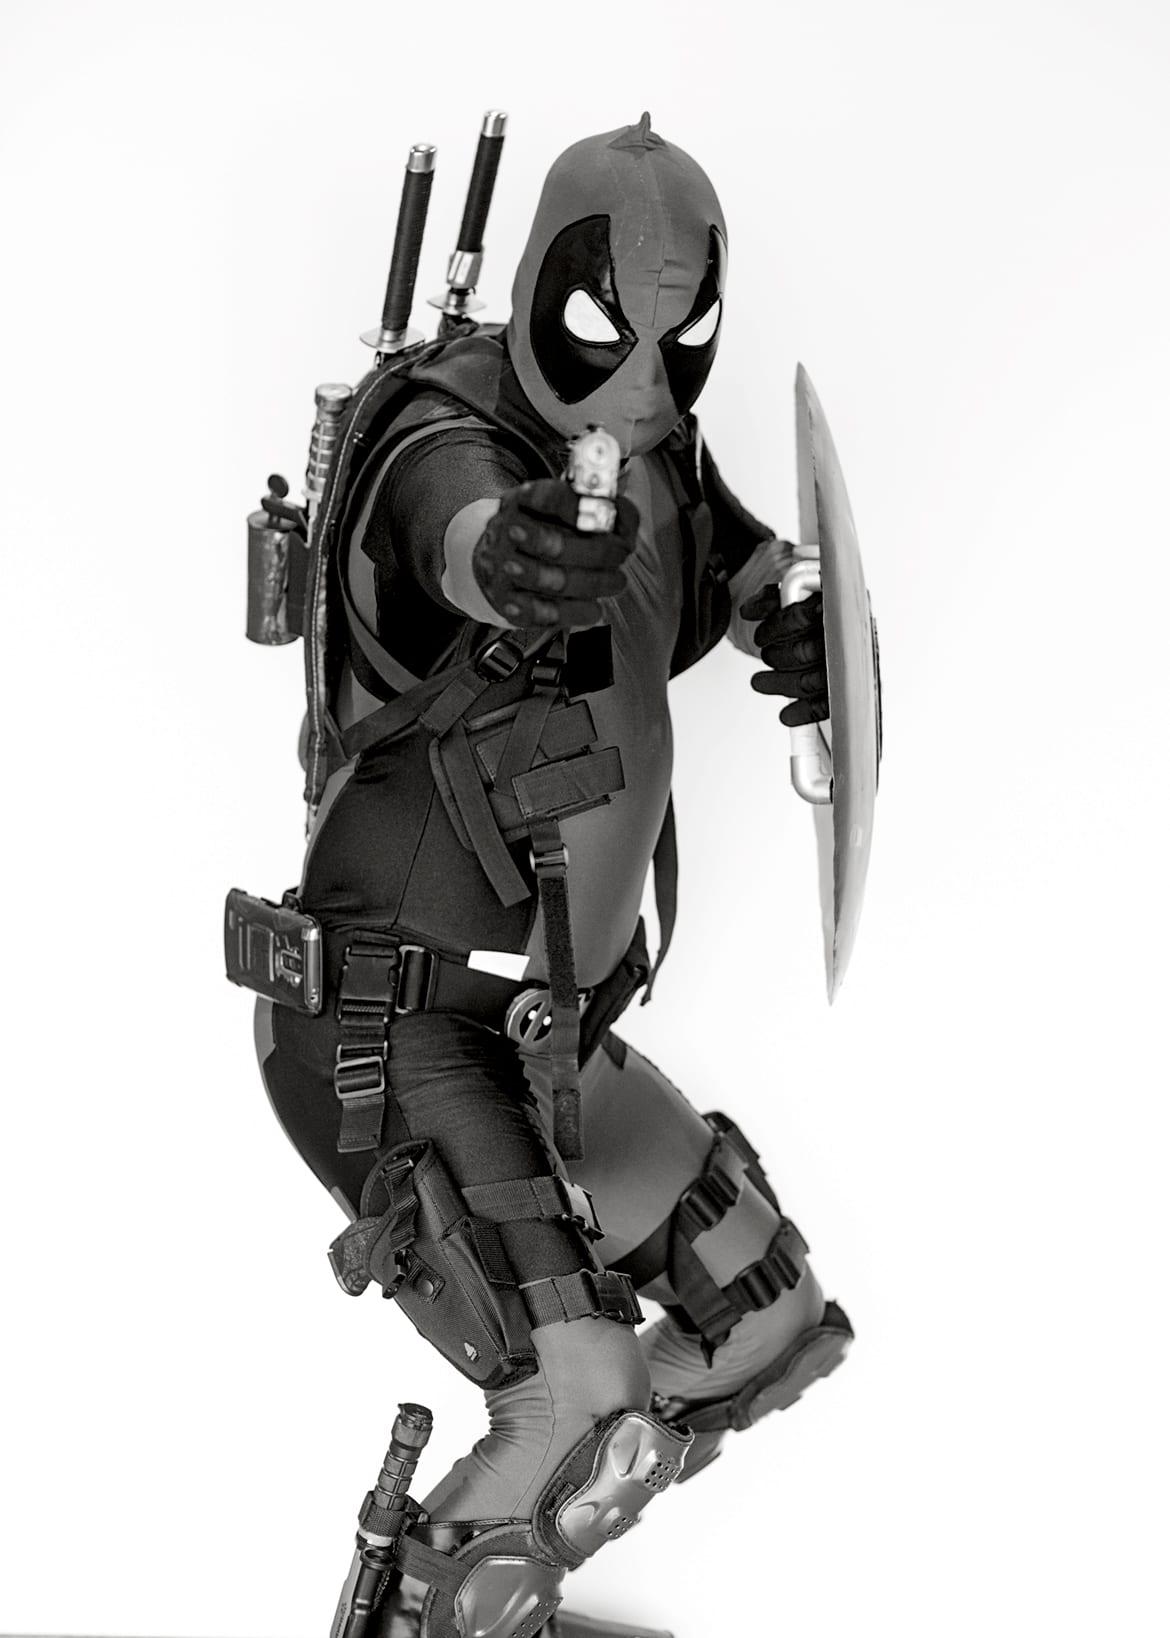 David Partelow cosplaying Deadpool